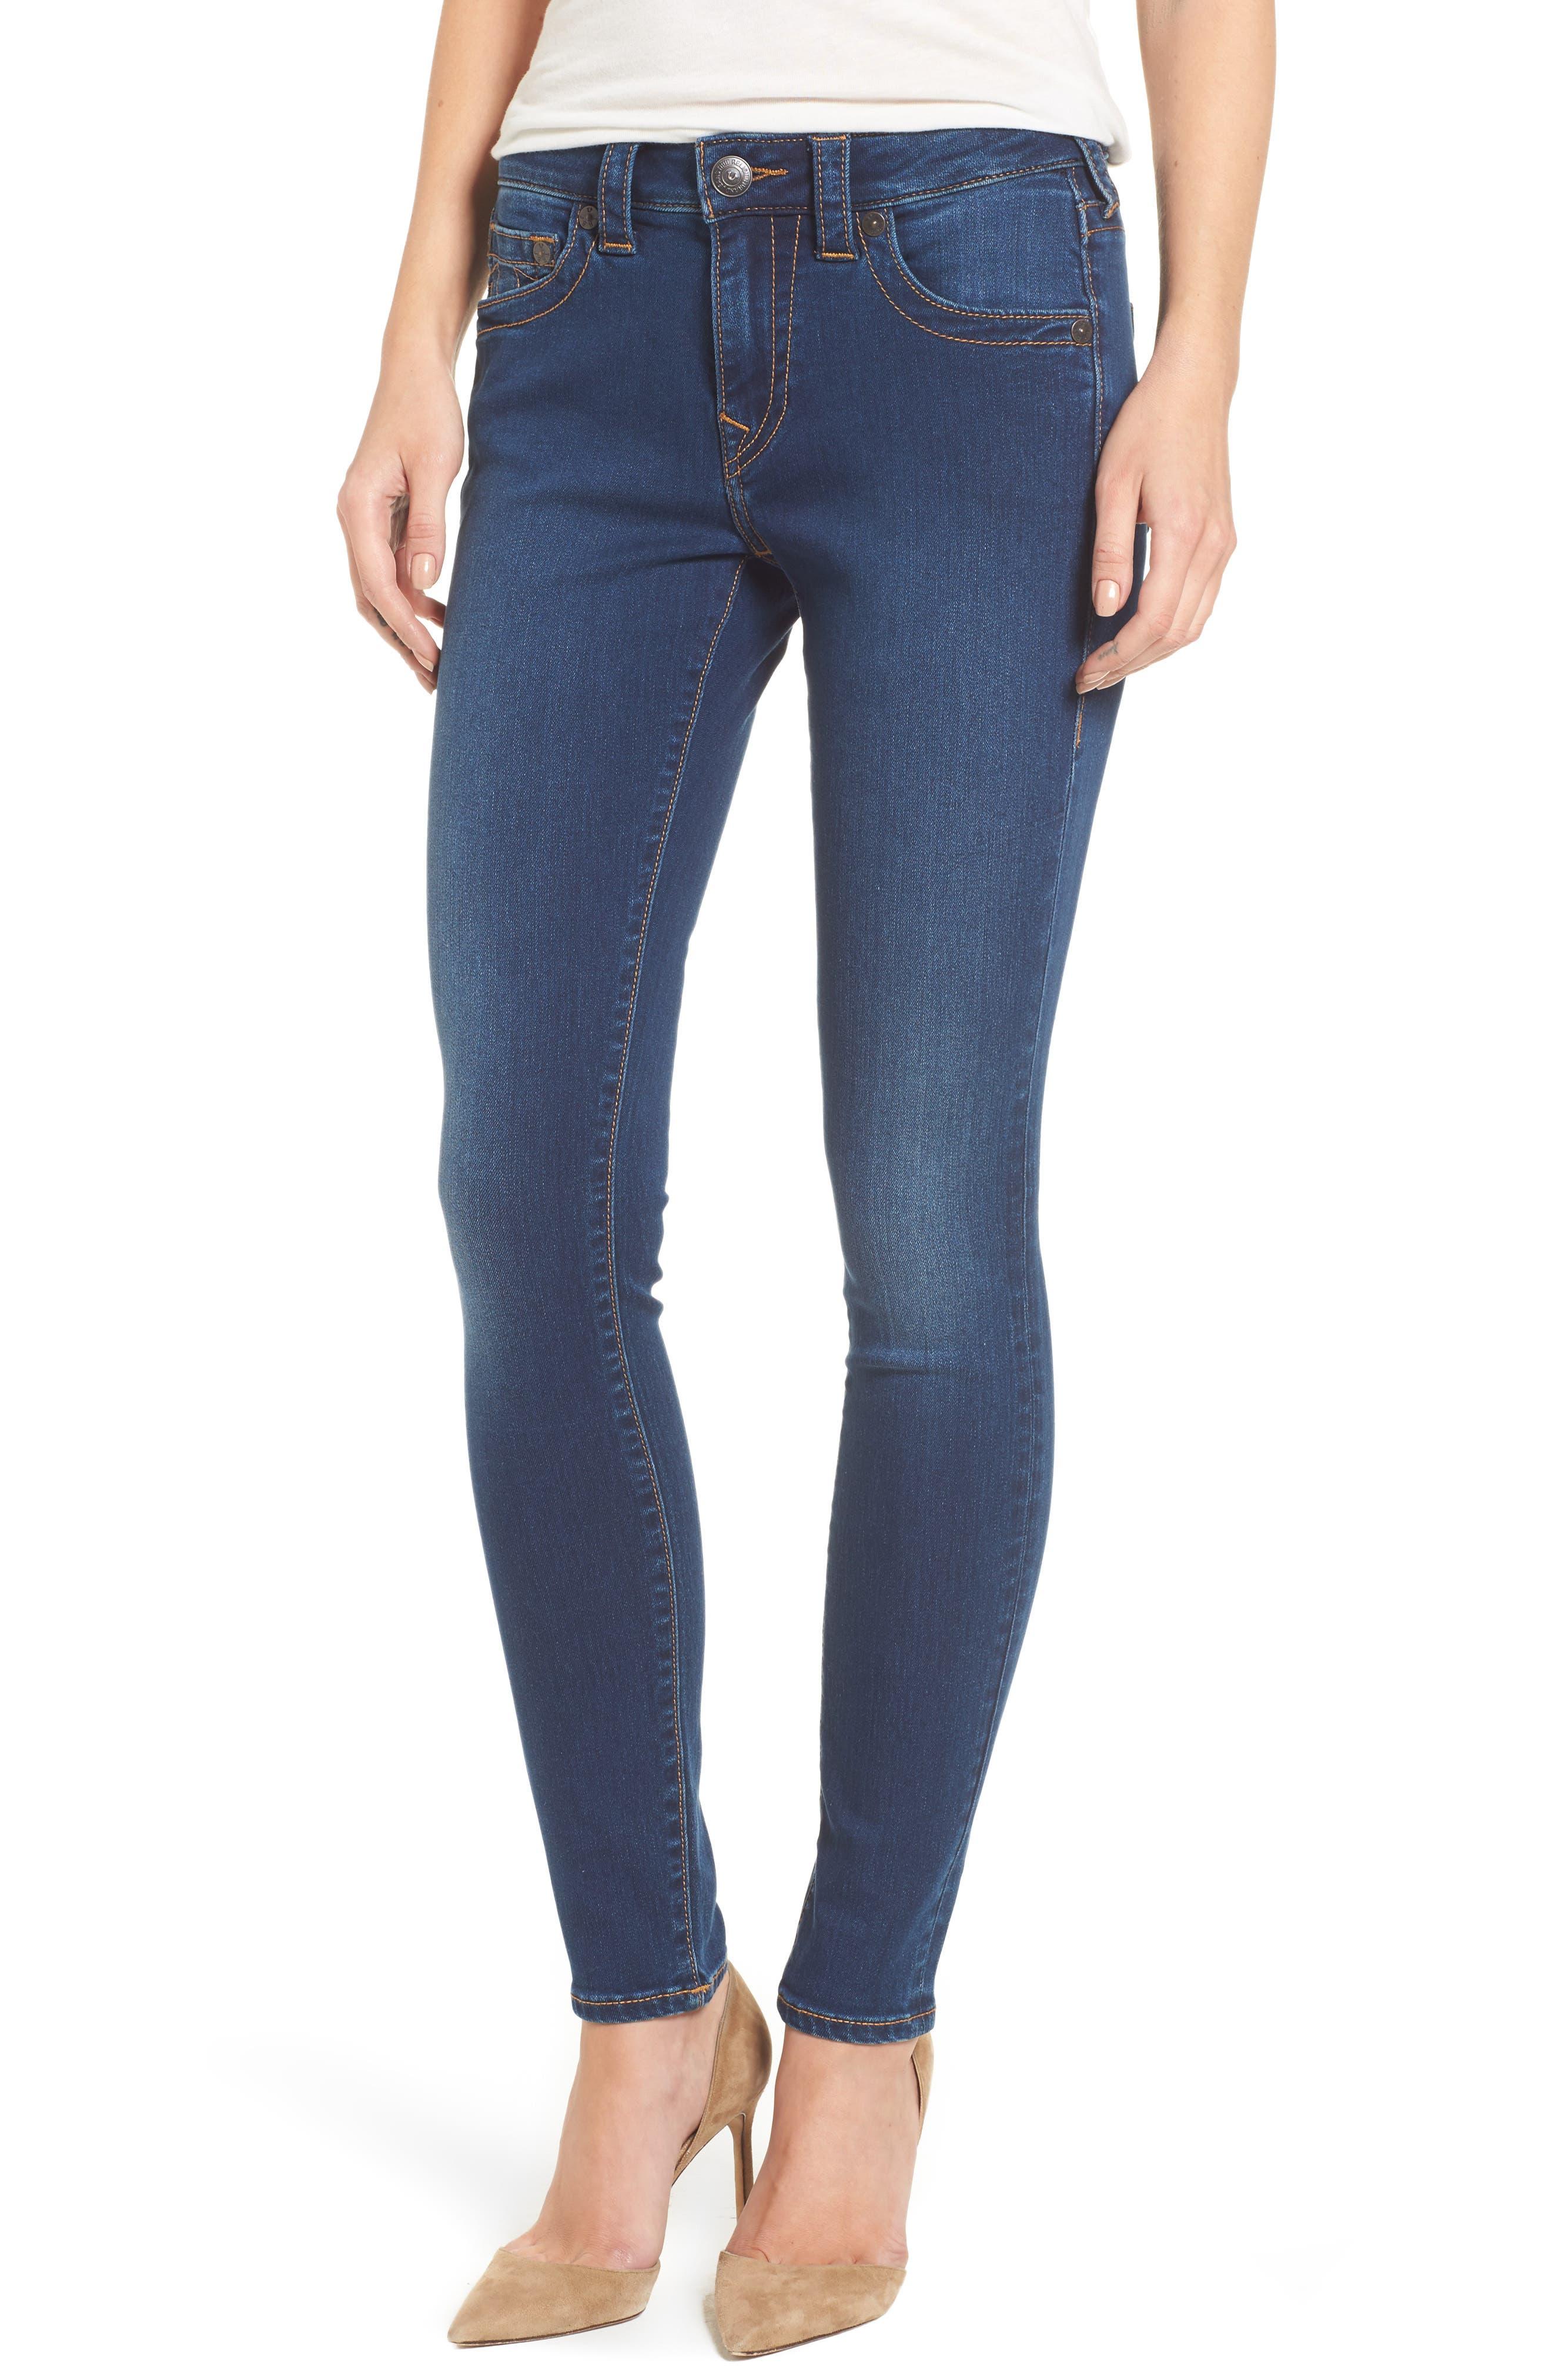 True Religion Brand Jeans Jennie Curvy Skinny Jeans (Lands End Indigo)